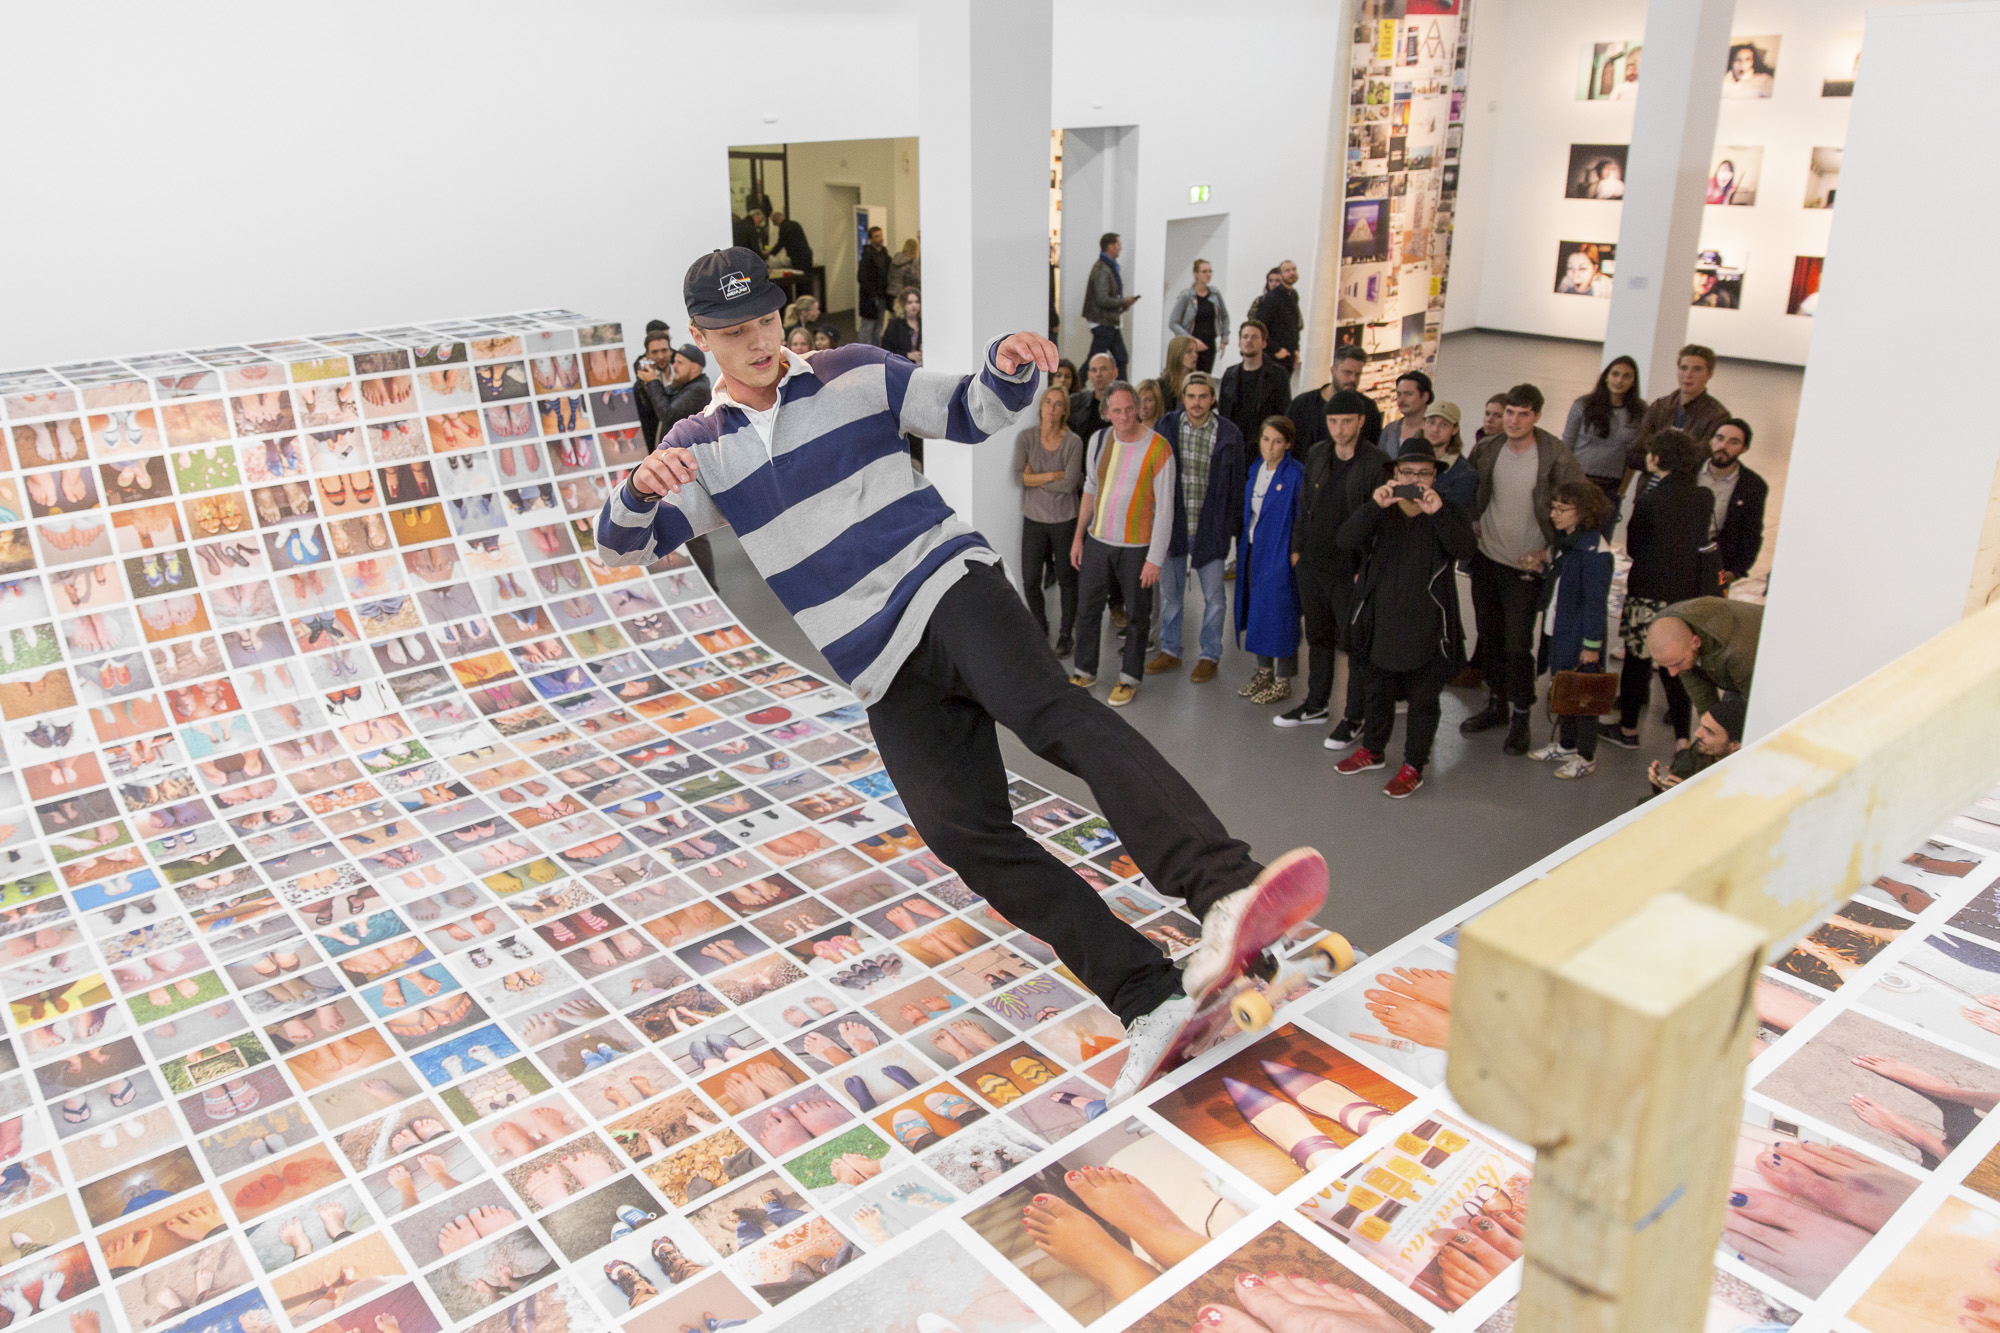 Erik-Kessels_My-Feet-2015_©-NRW-Forum_Foto-Andreas-Kuschner-ALIMONIE.jpg